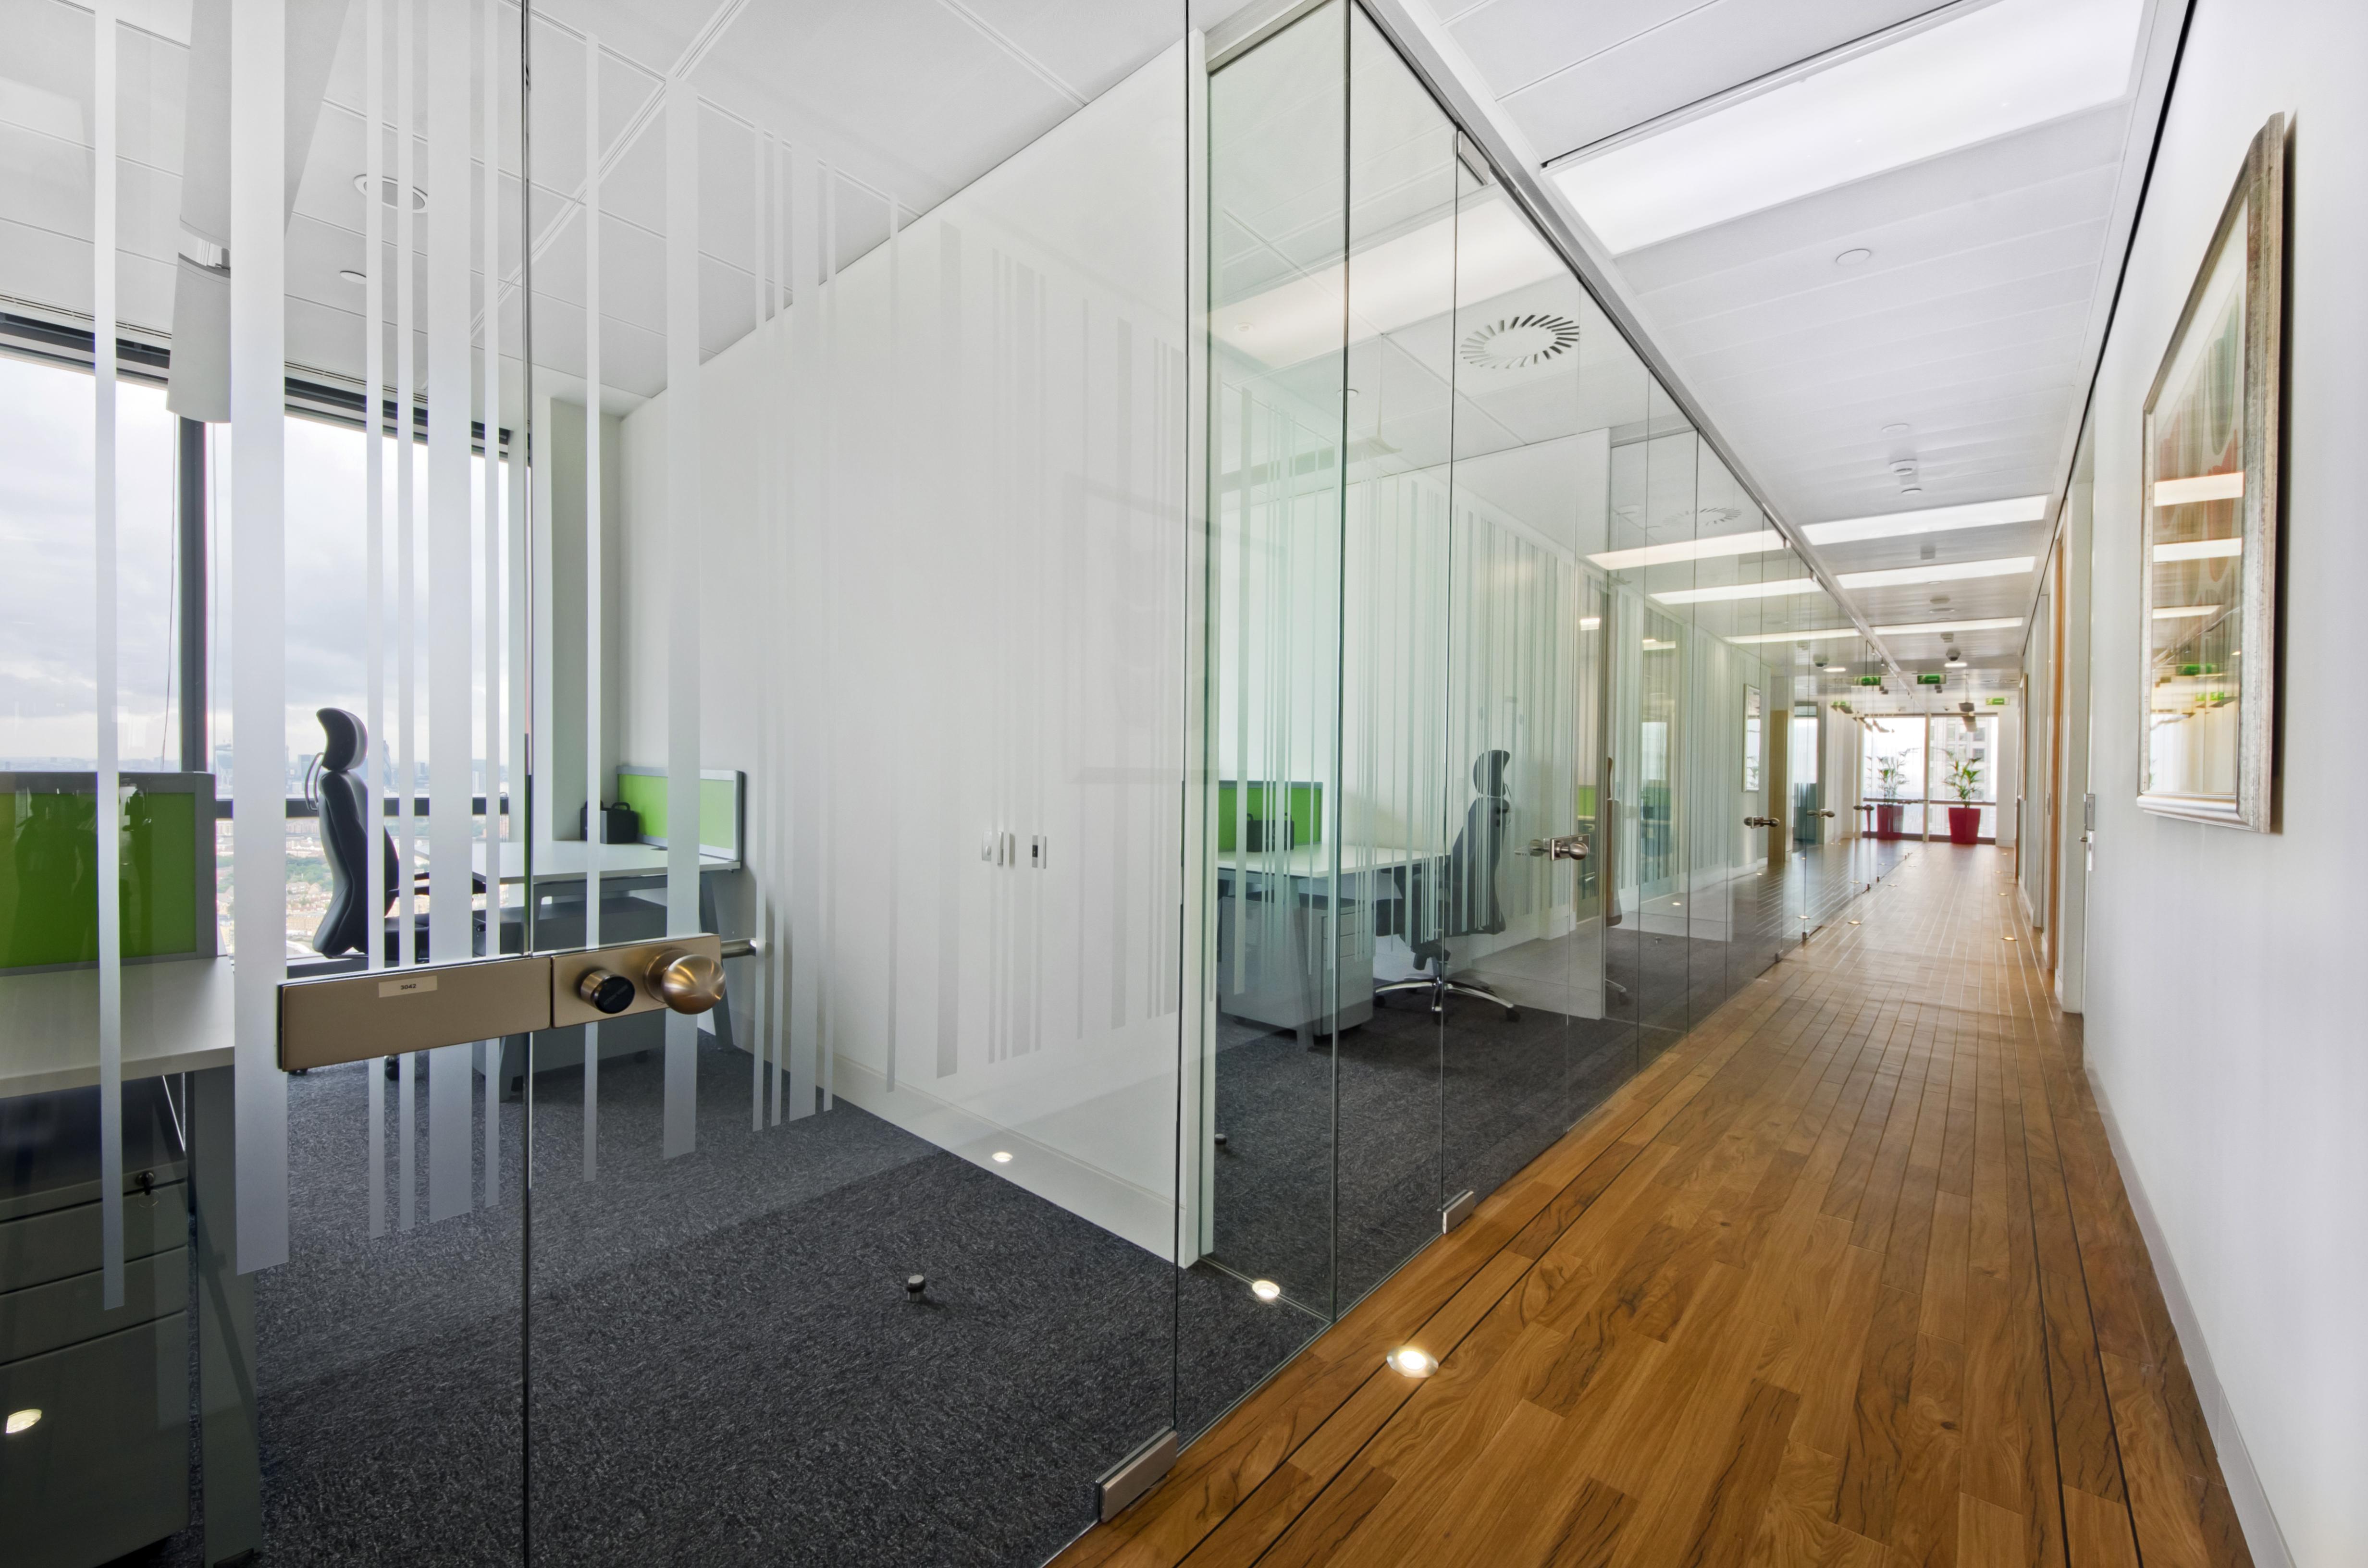 hallway-canary-wharf-office-space